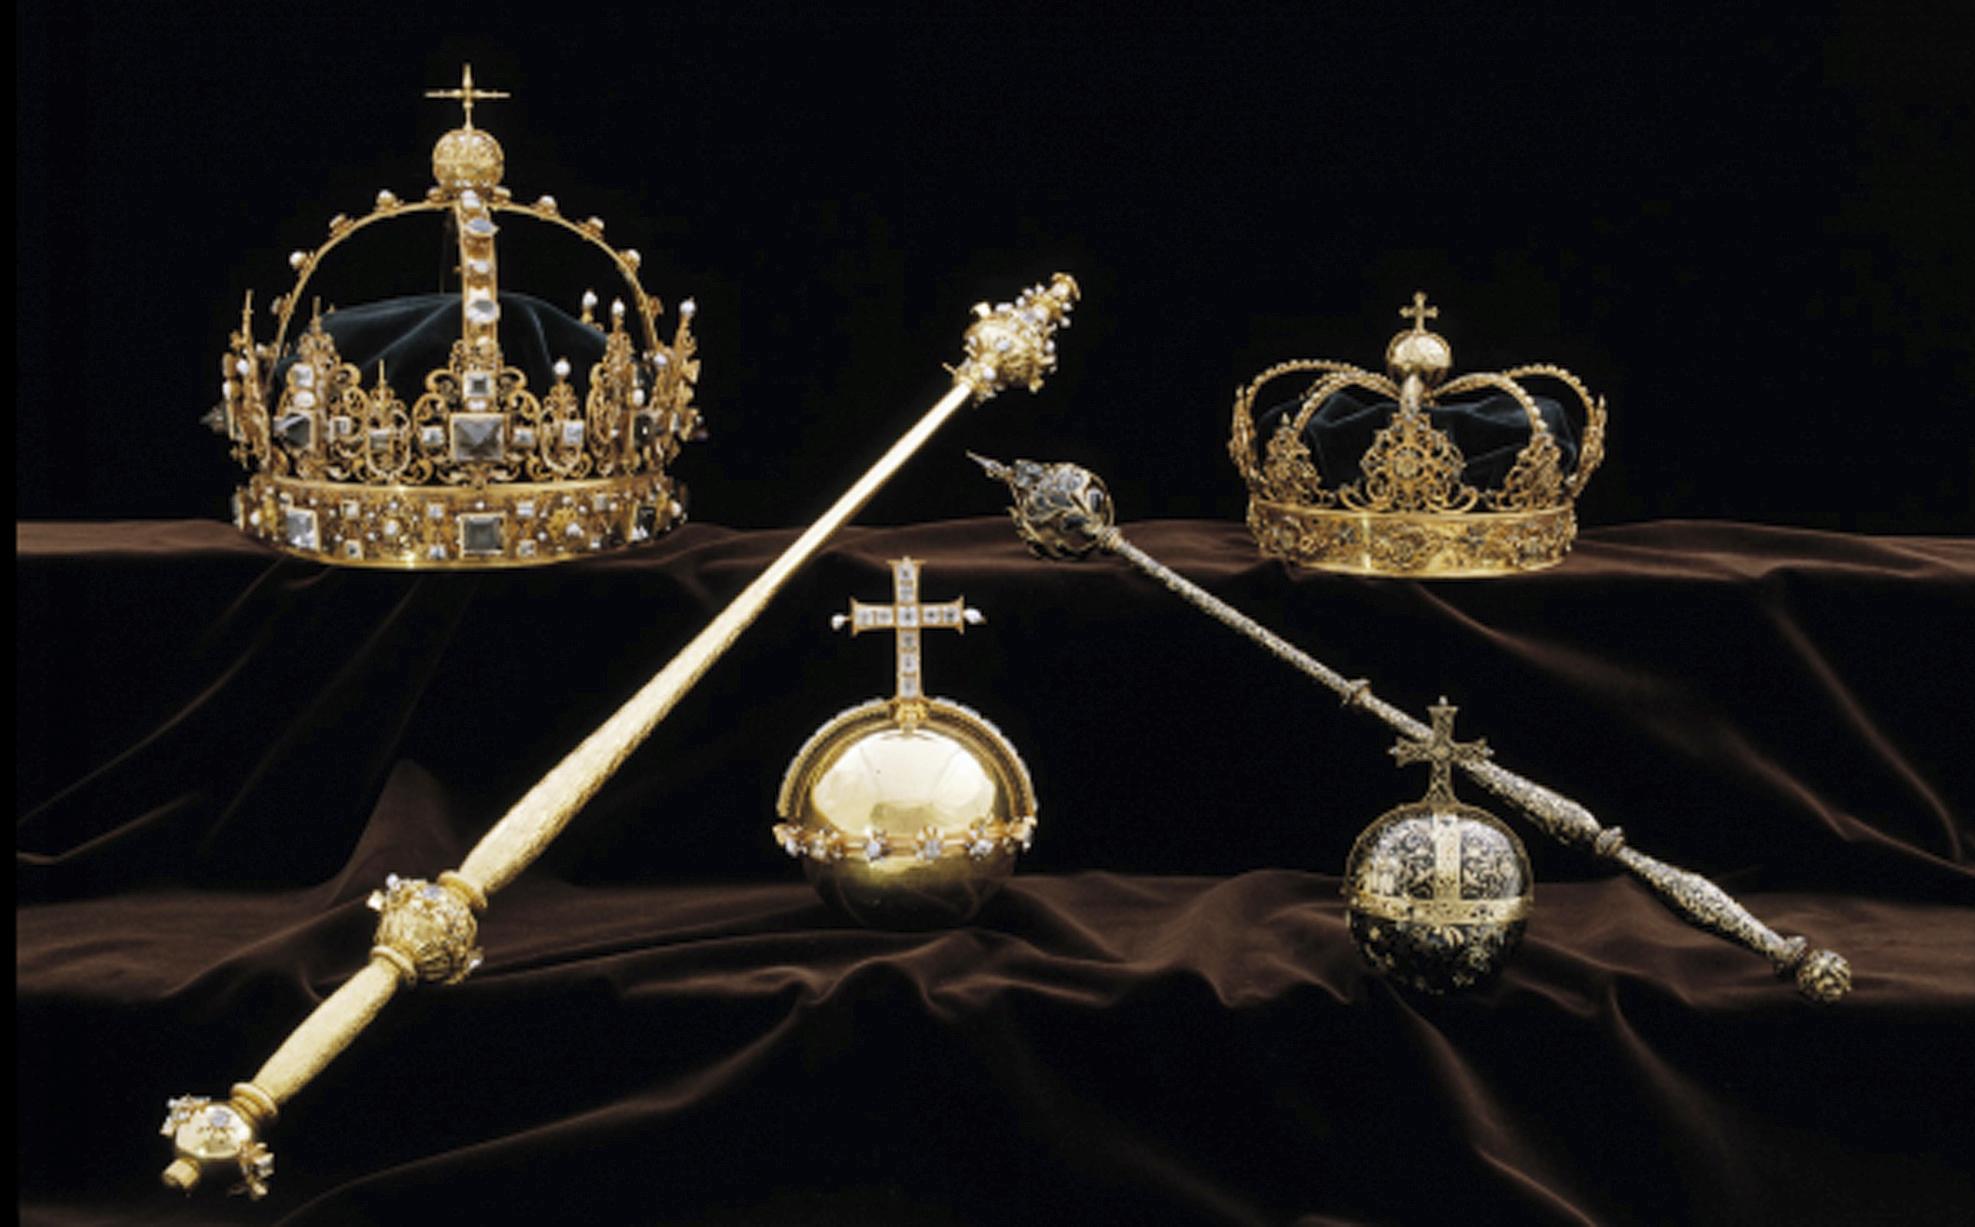 Sweden_Crown_Heist_76426-159532.jpg08336579